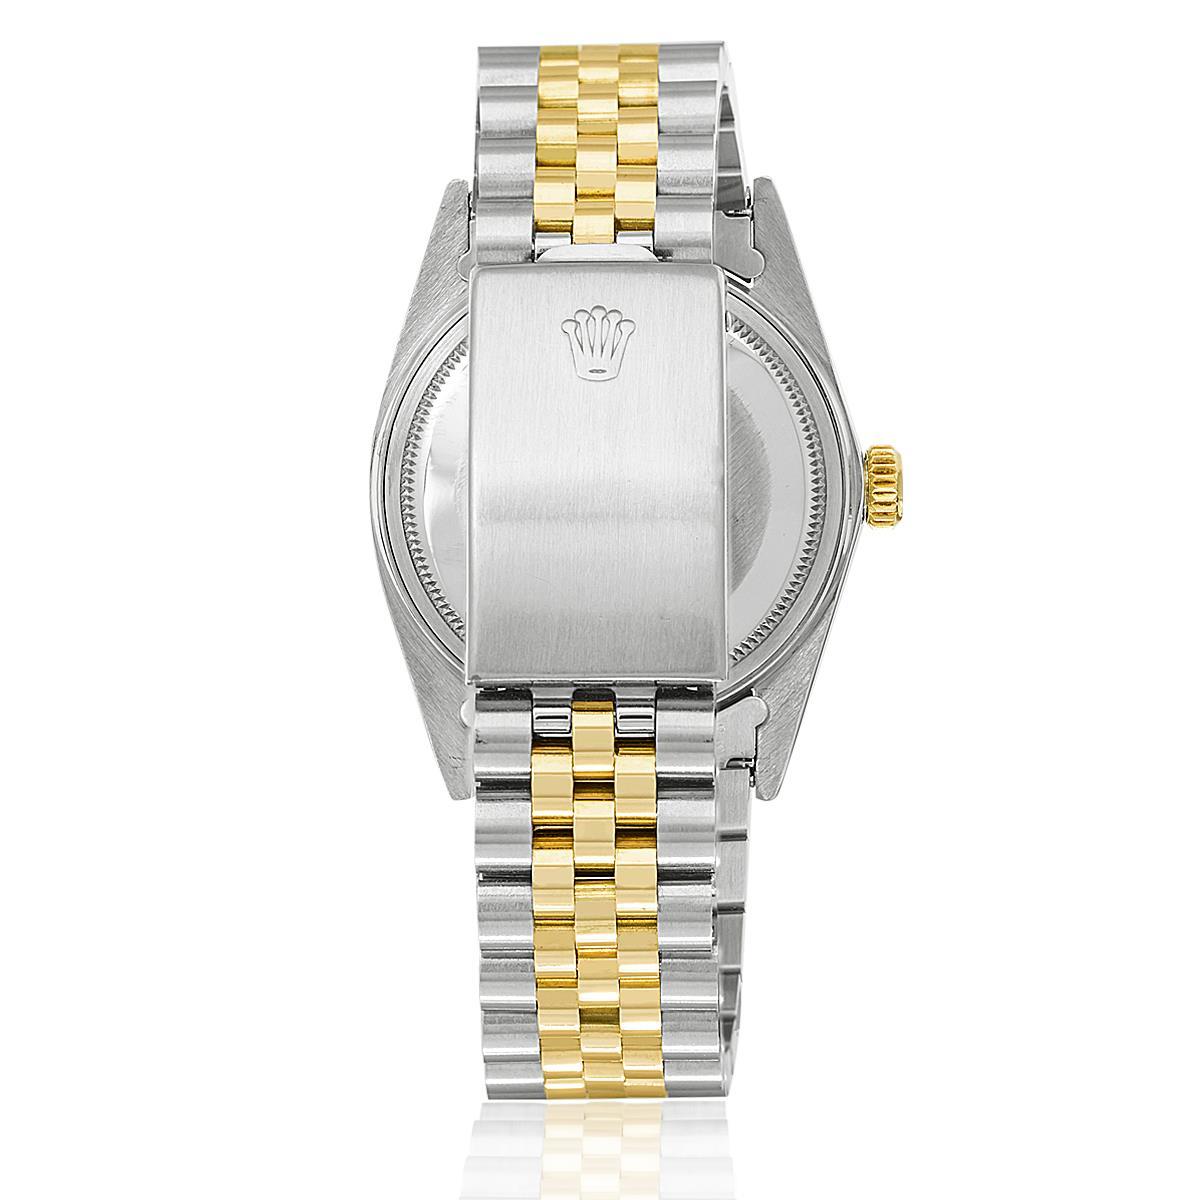 6669de47879 Relógio Masculino Rolex Datejust